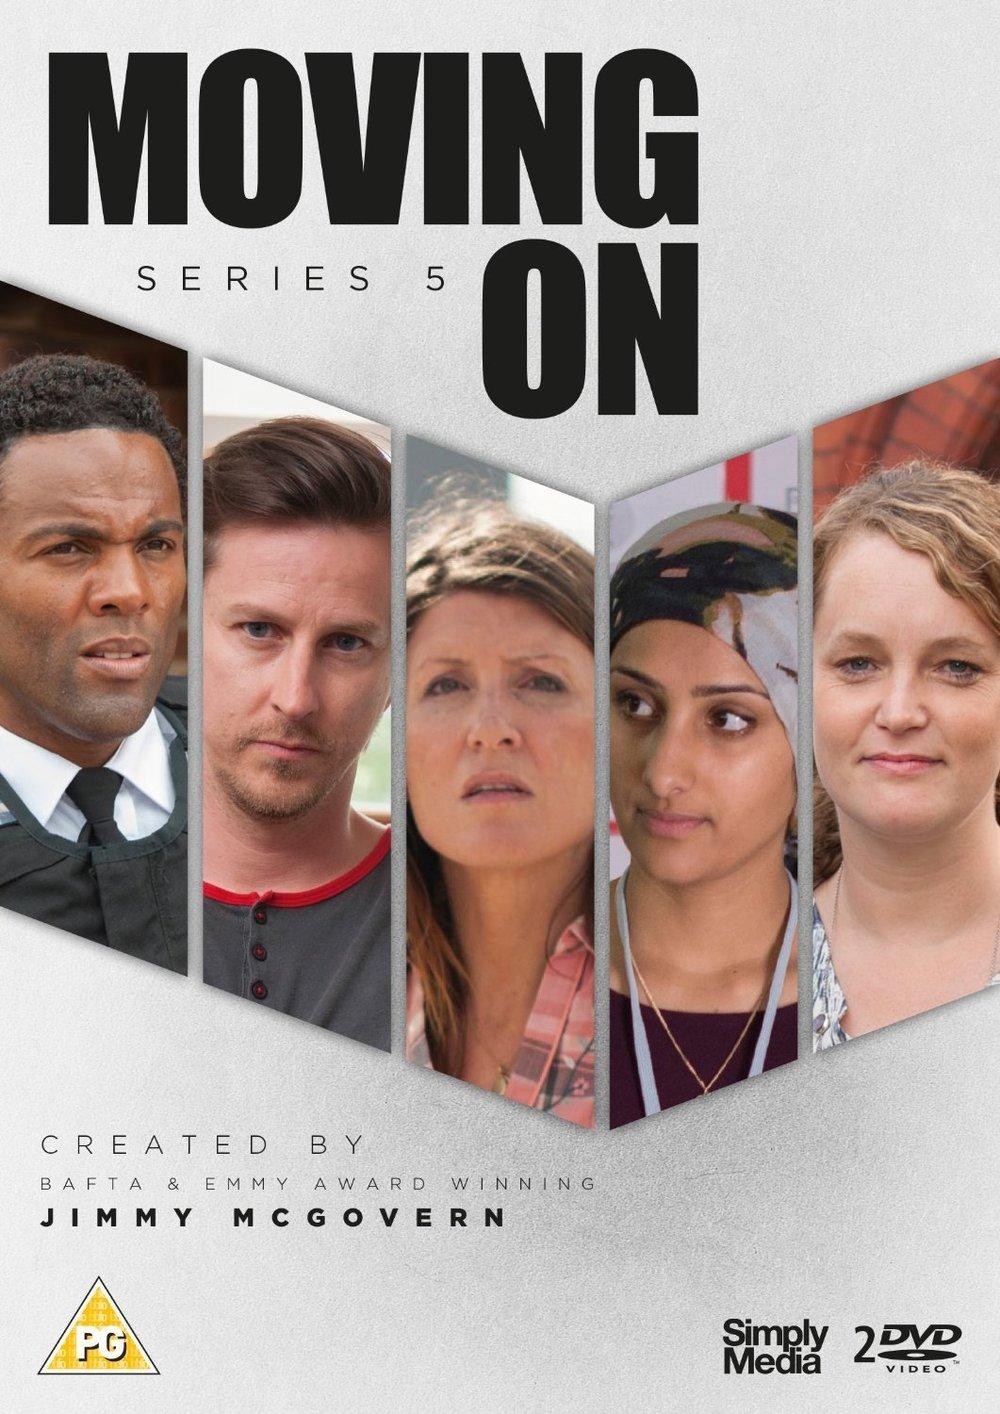 Moving On Series 5 DVD.jpg